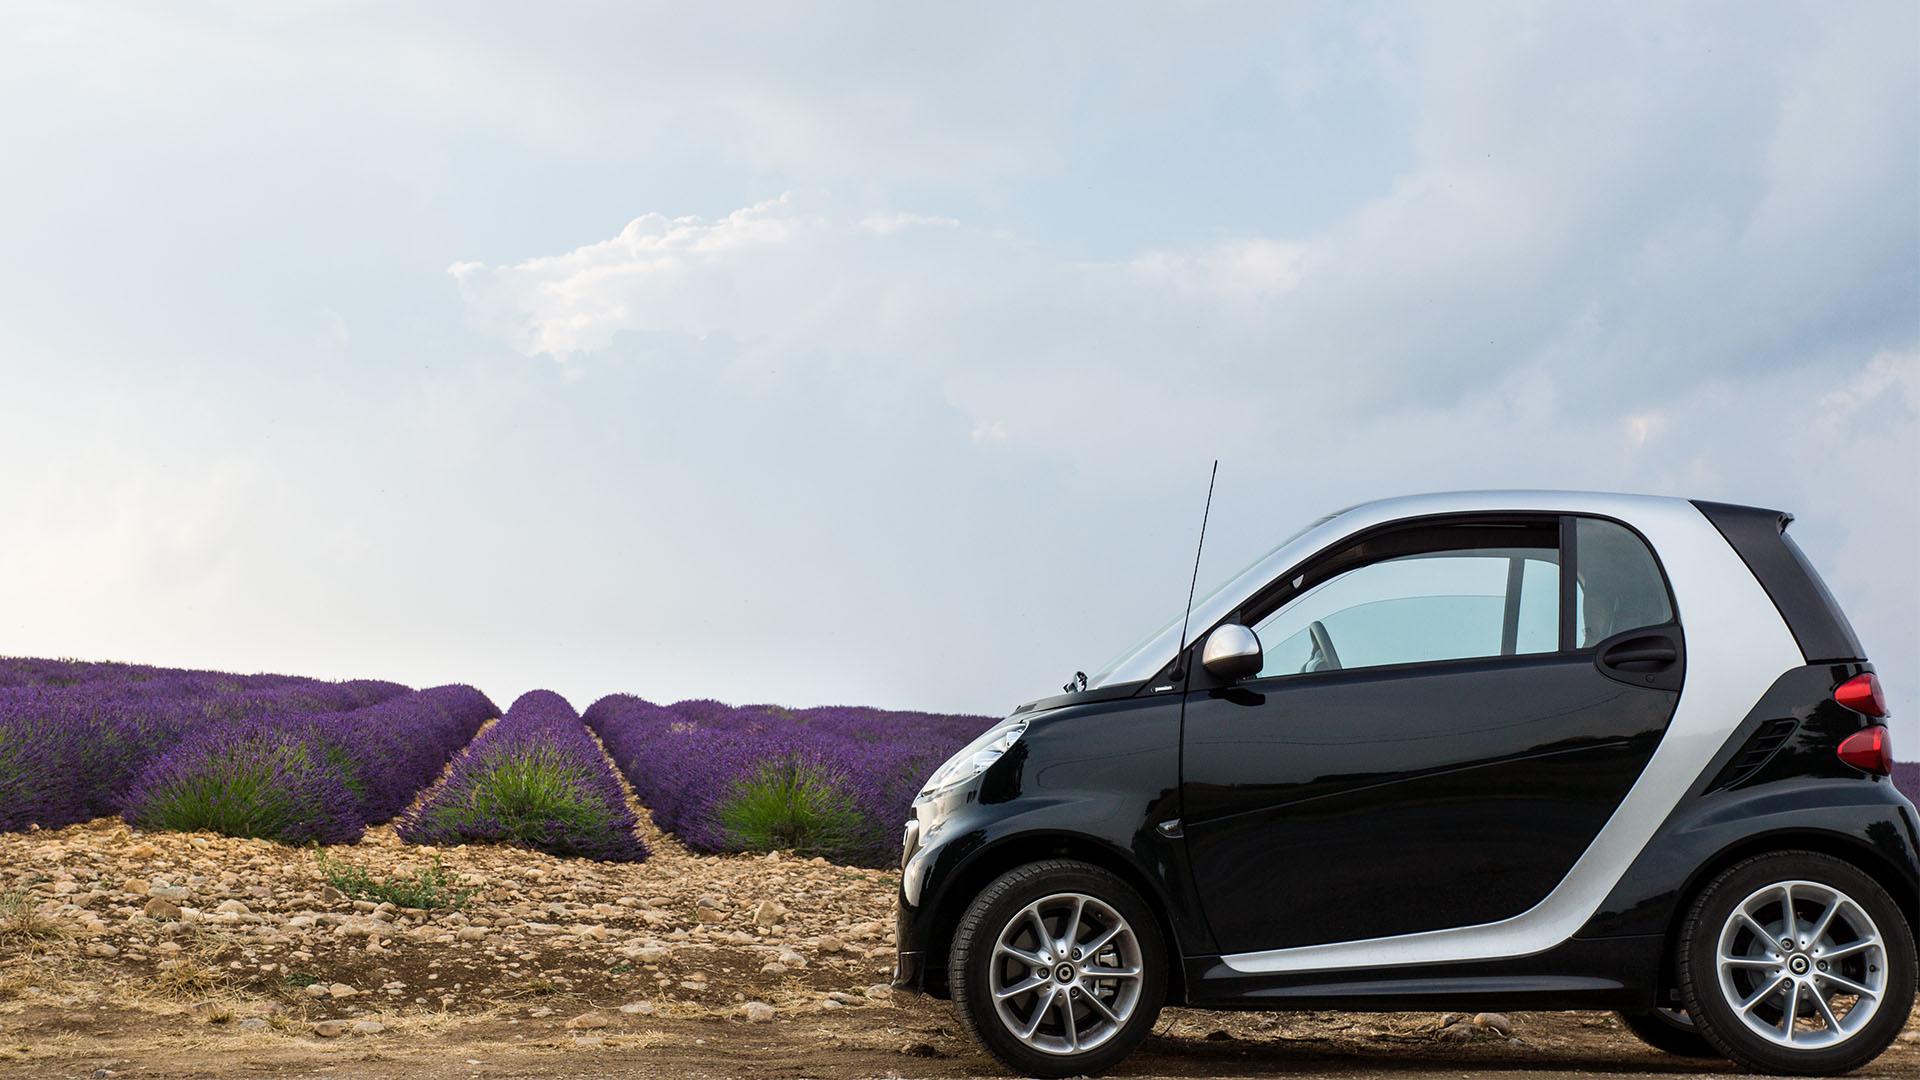 a parked smart car